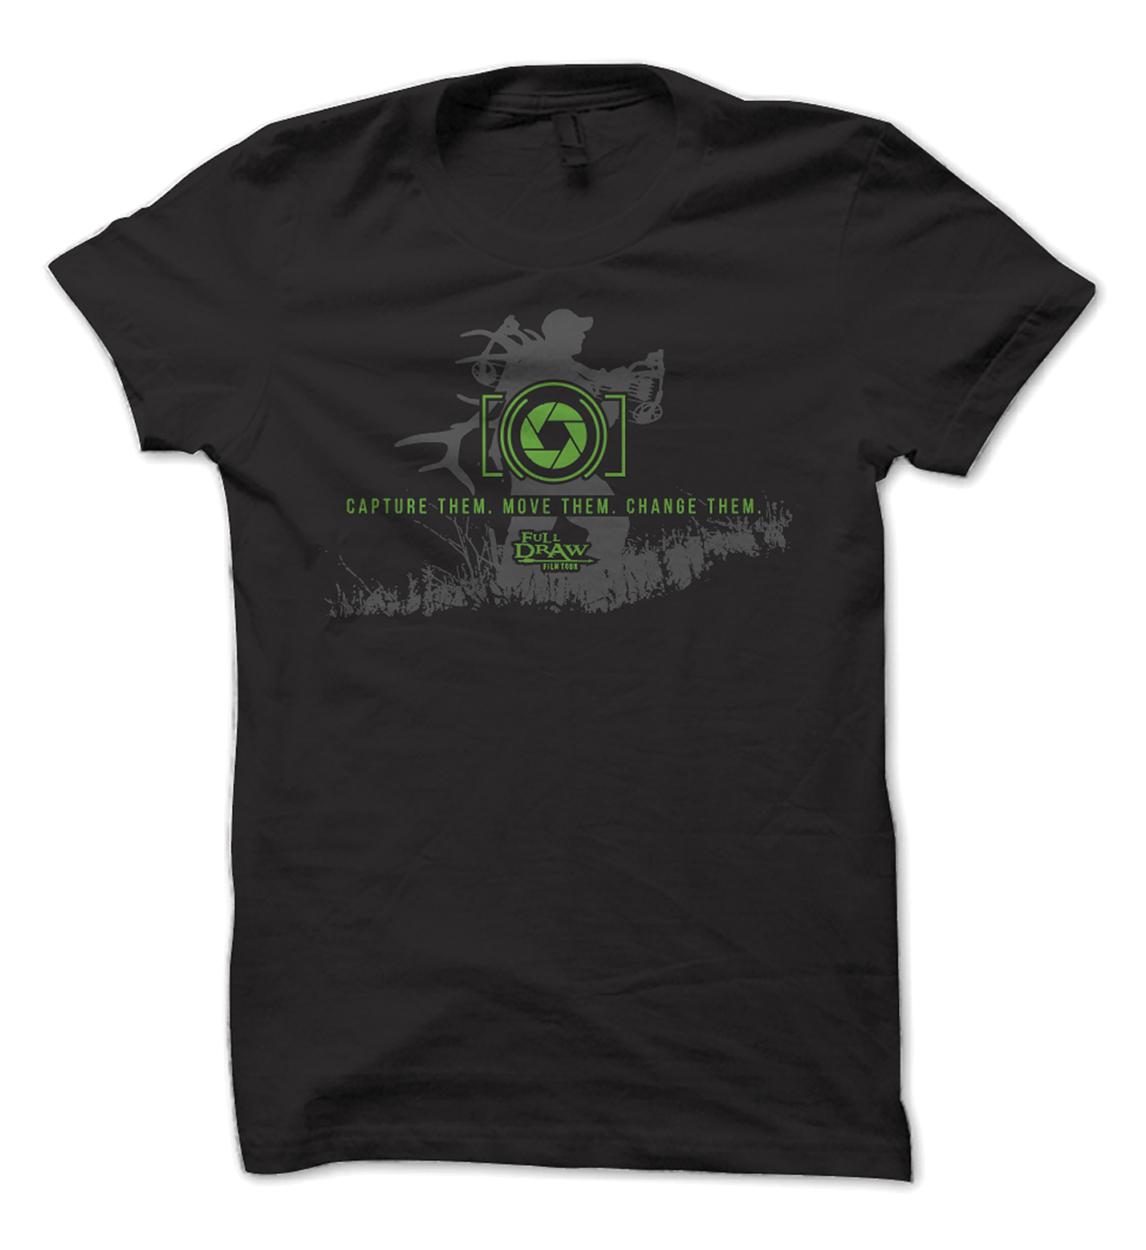 Full Draw Film Tour Photography Outdoor Shirt Design